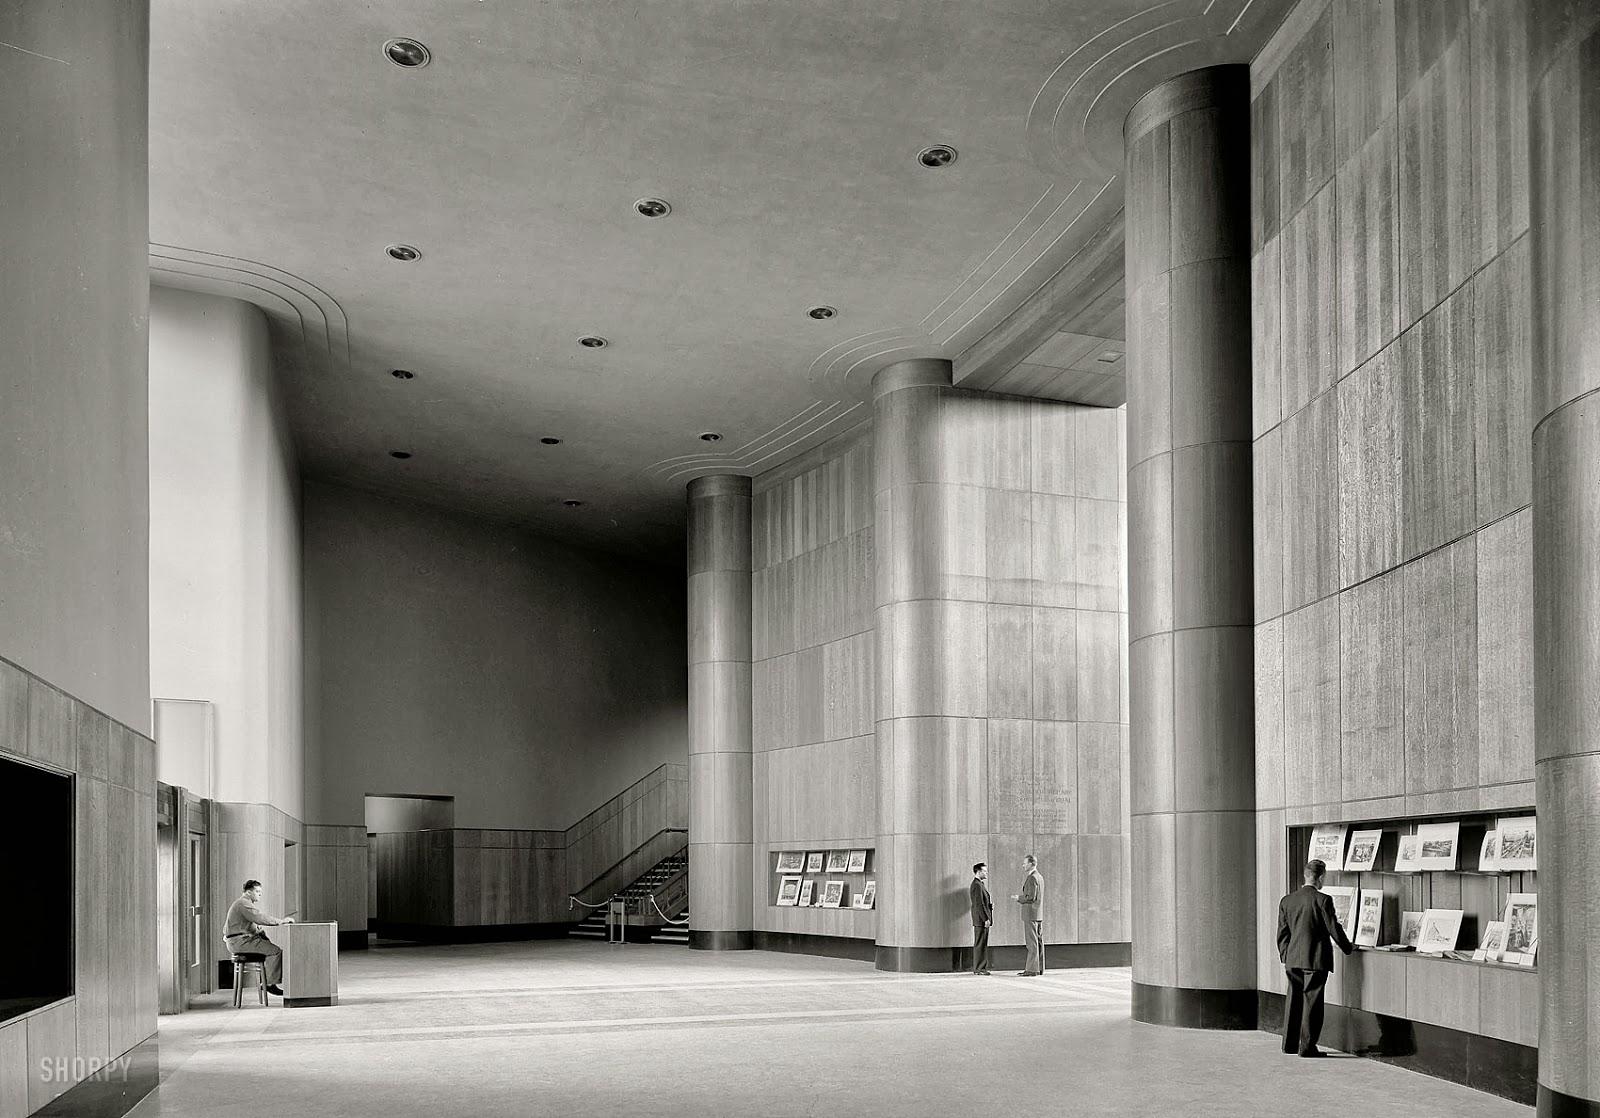 Foyer Architecture Library : Manerasdeestarenelmundo septiembre